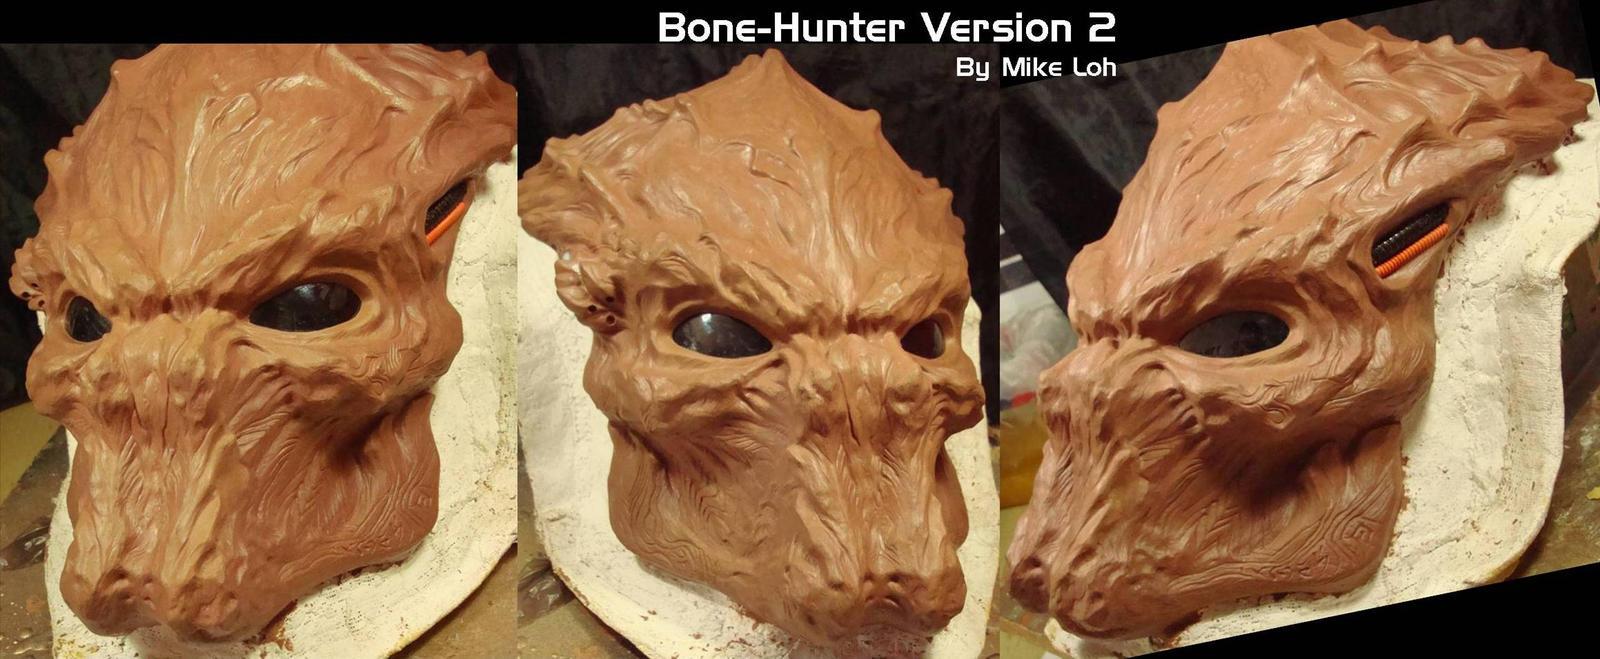 Bonehunter V2 Details by Uratz-Studios